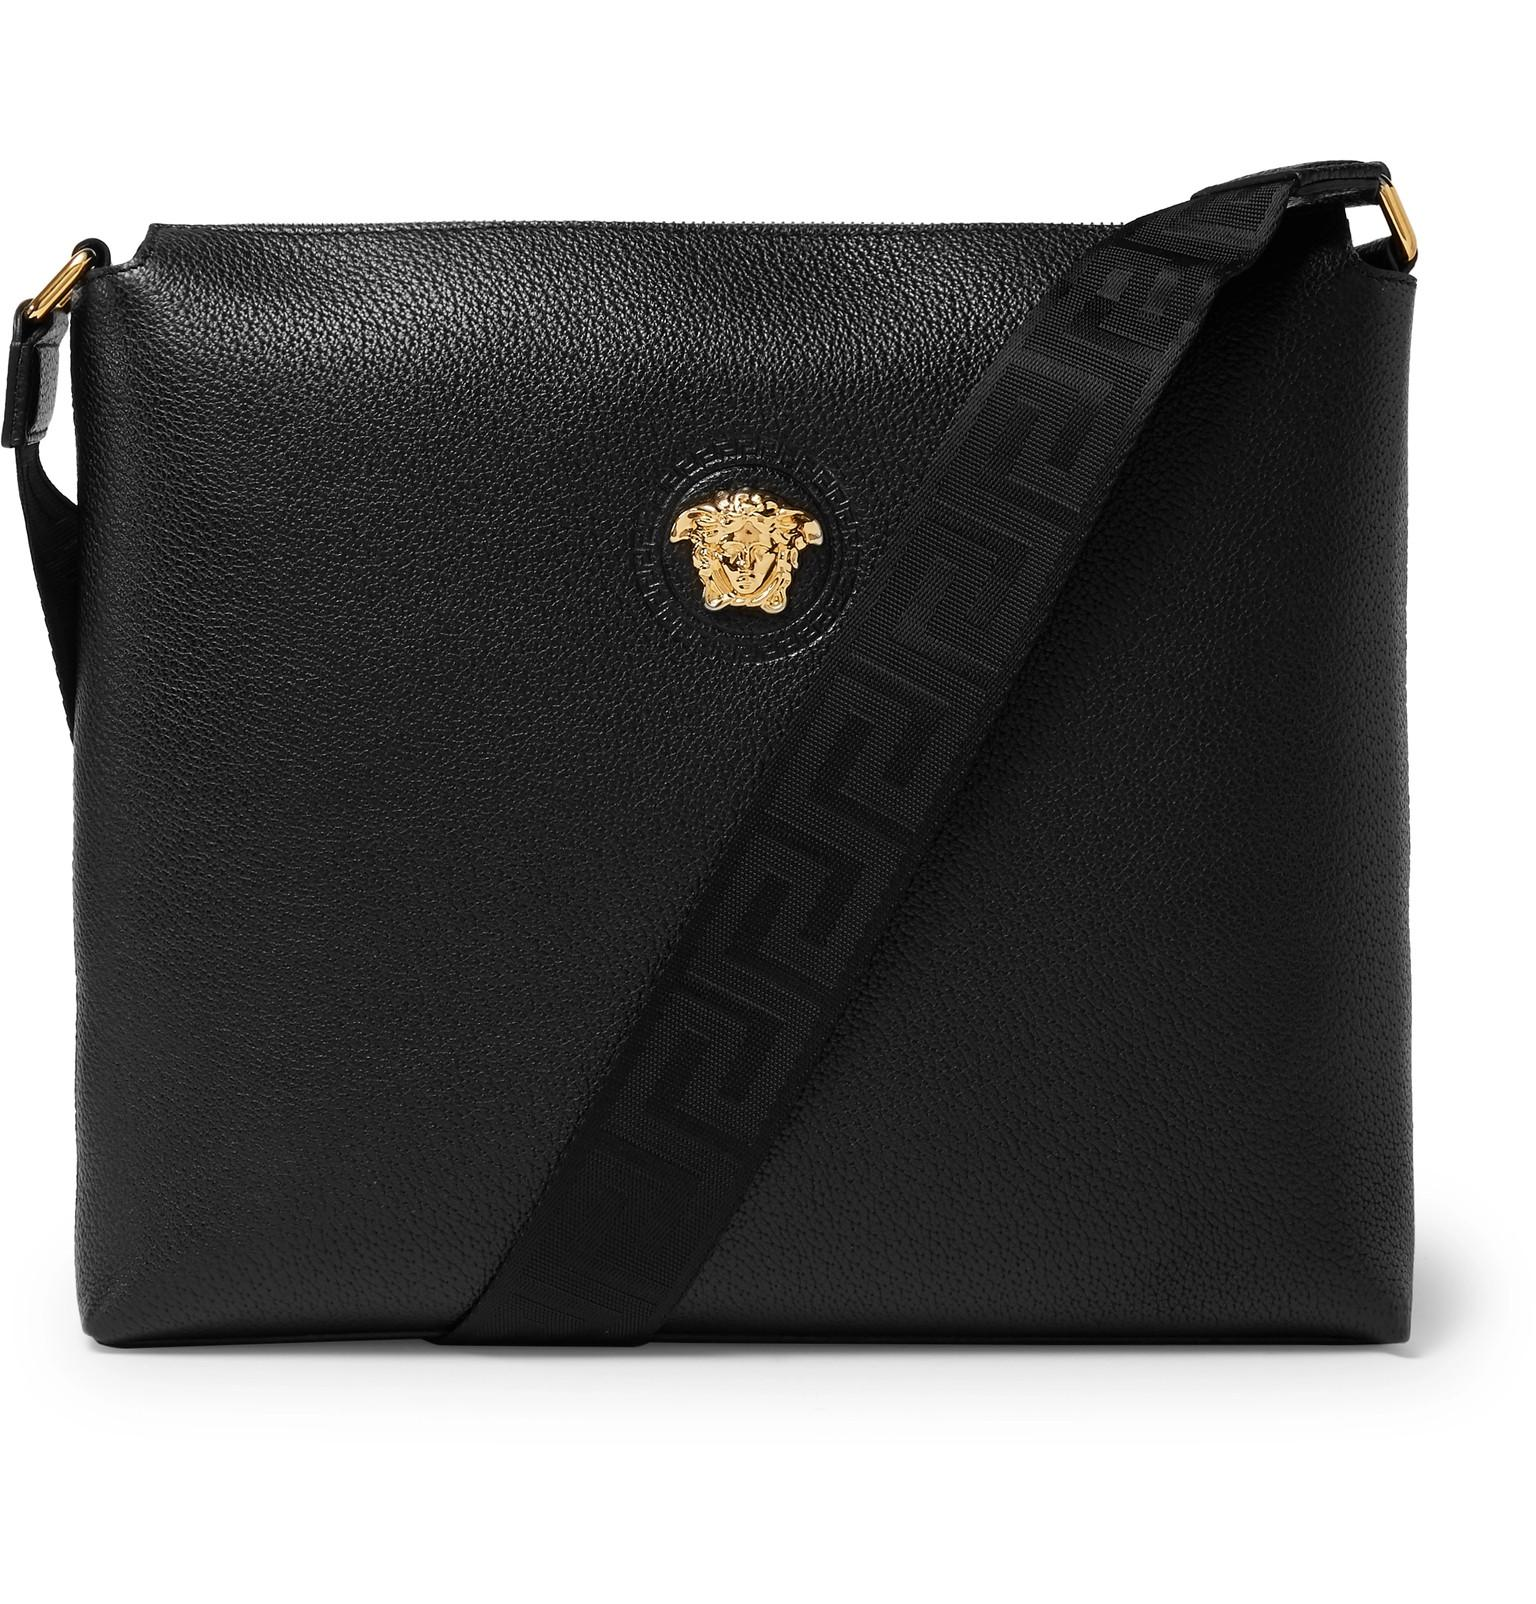 Lyst - Versace Logo-detailed Full-grain Leather Messenger Bag in ... 5dccca5515c56